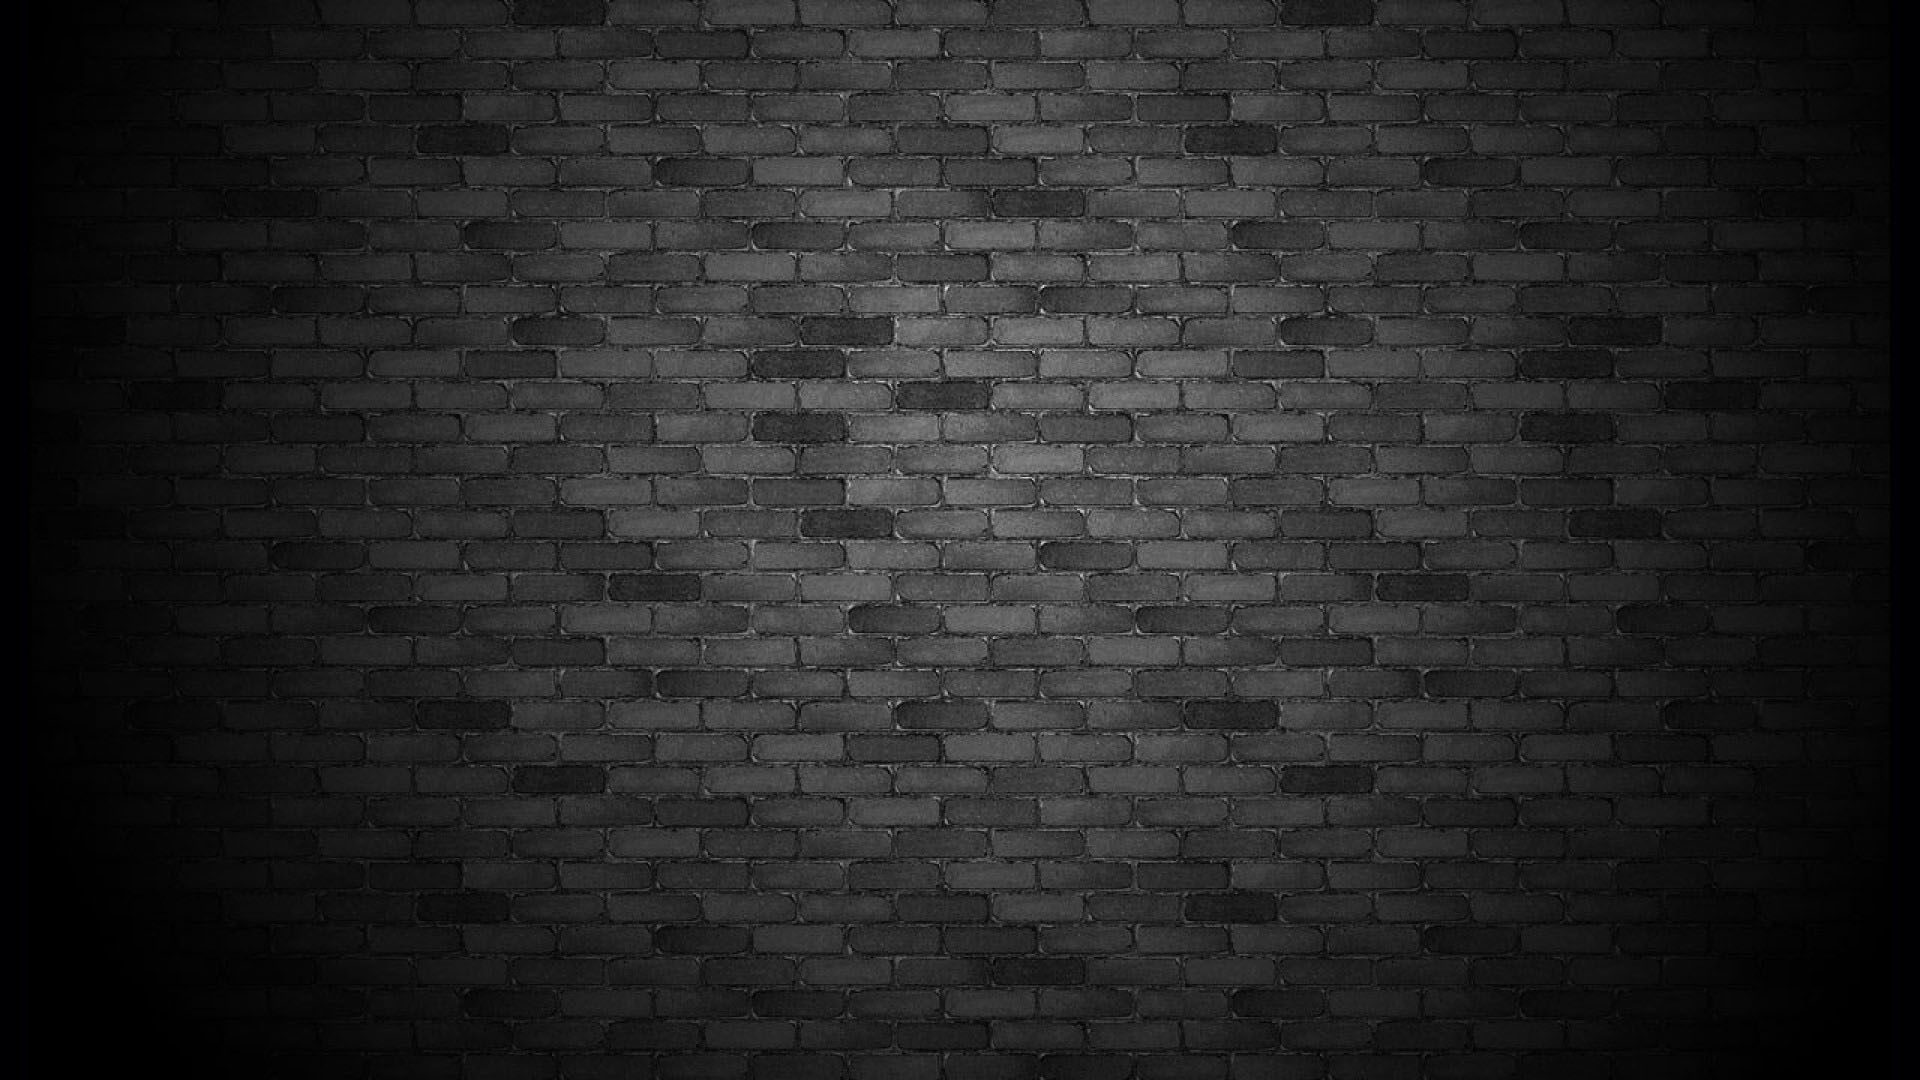 Vinyl Custom Photography Backdrops Brick Wall And Wood